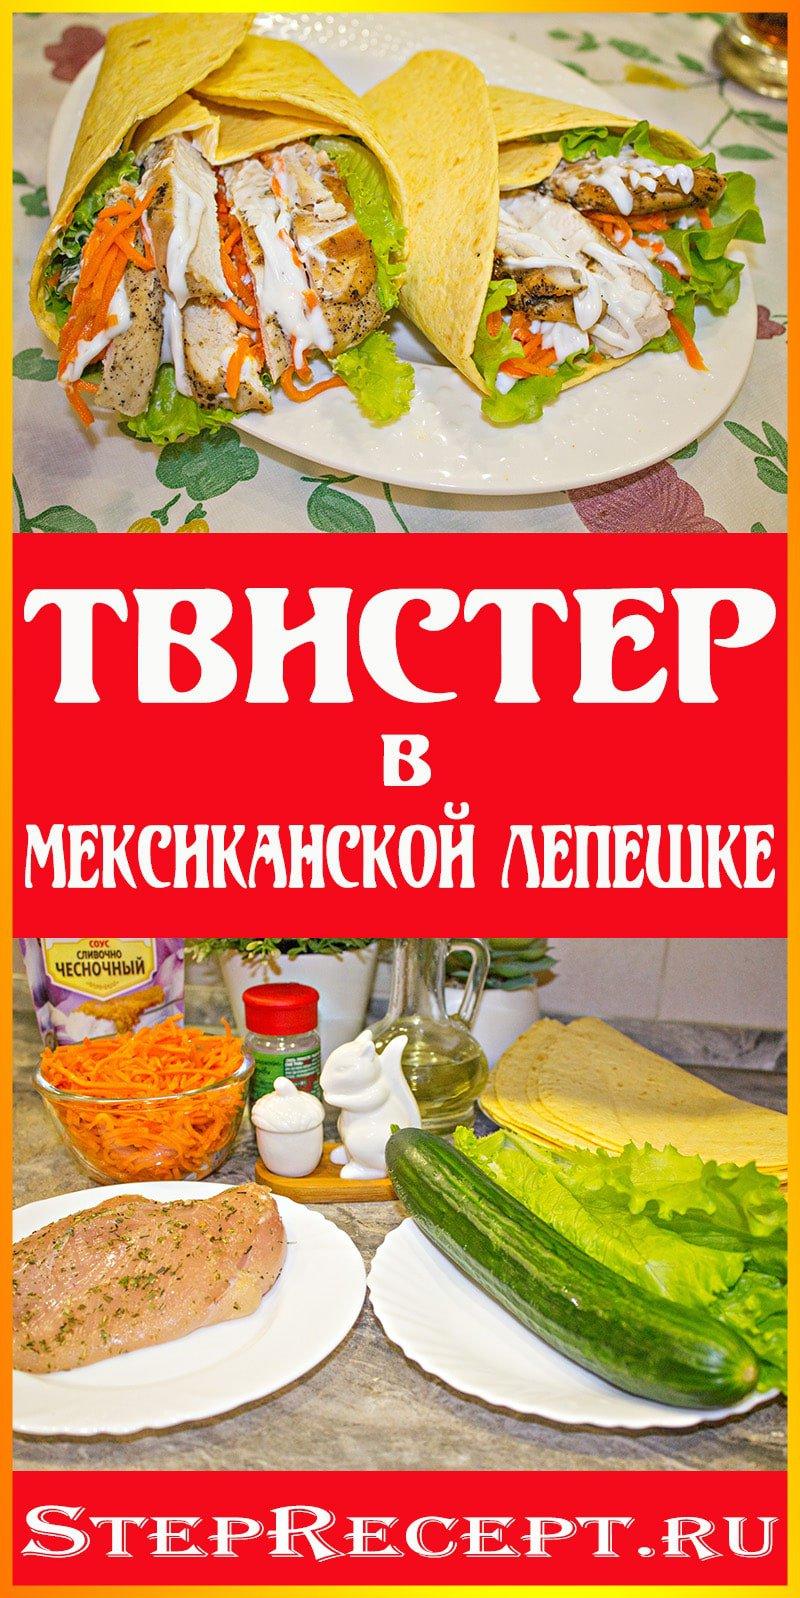 рецепт твистера из kfc в домашних условиях